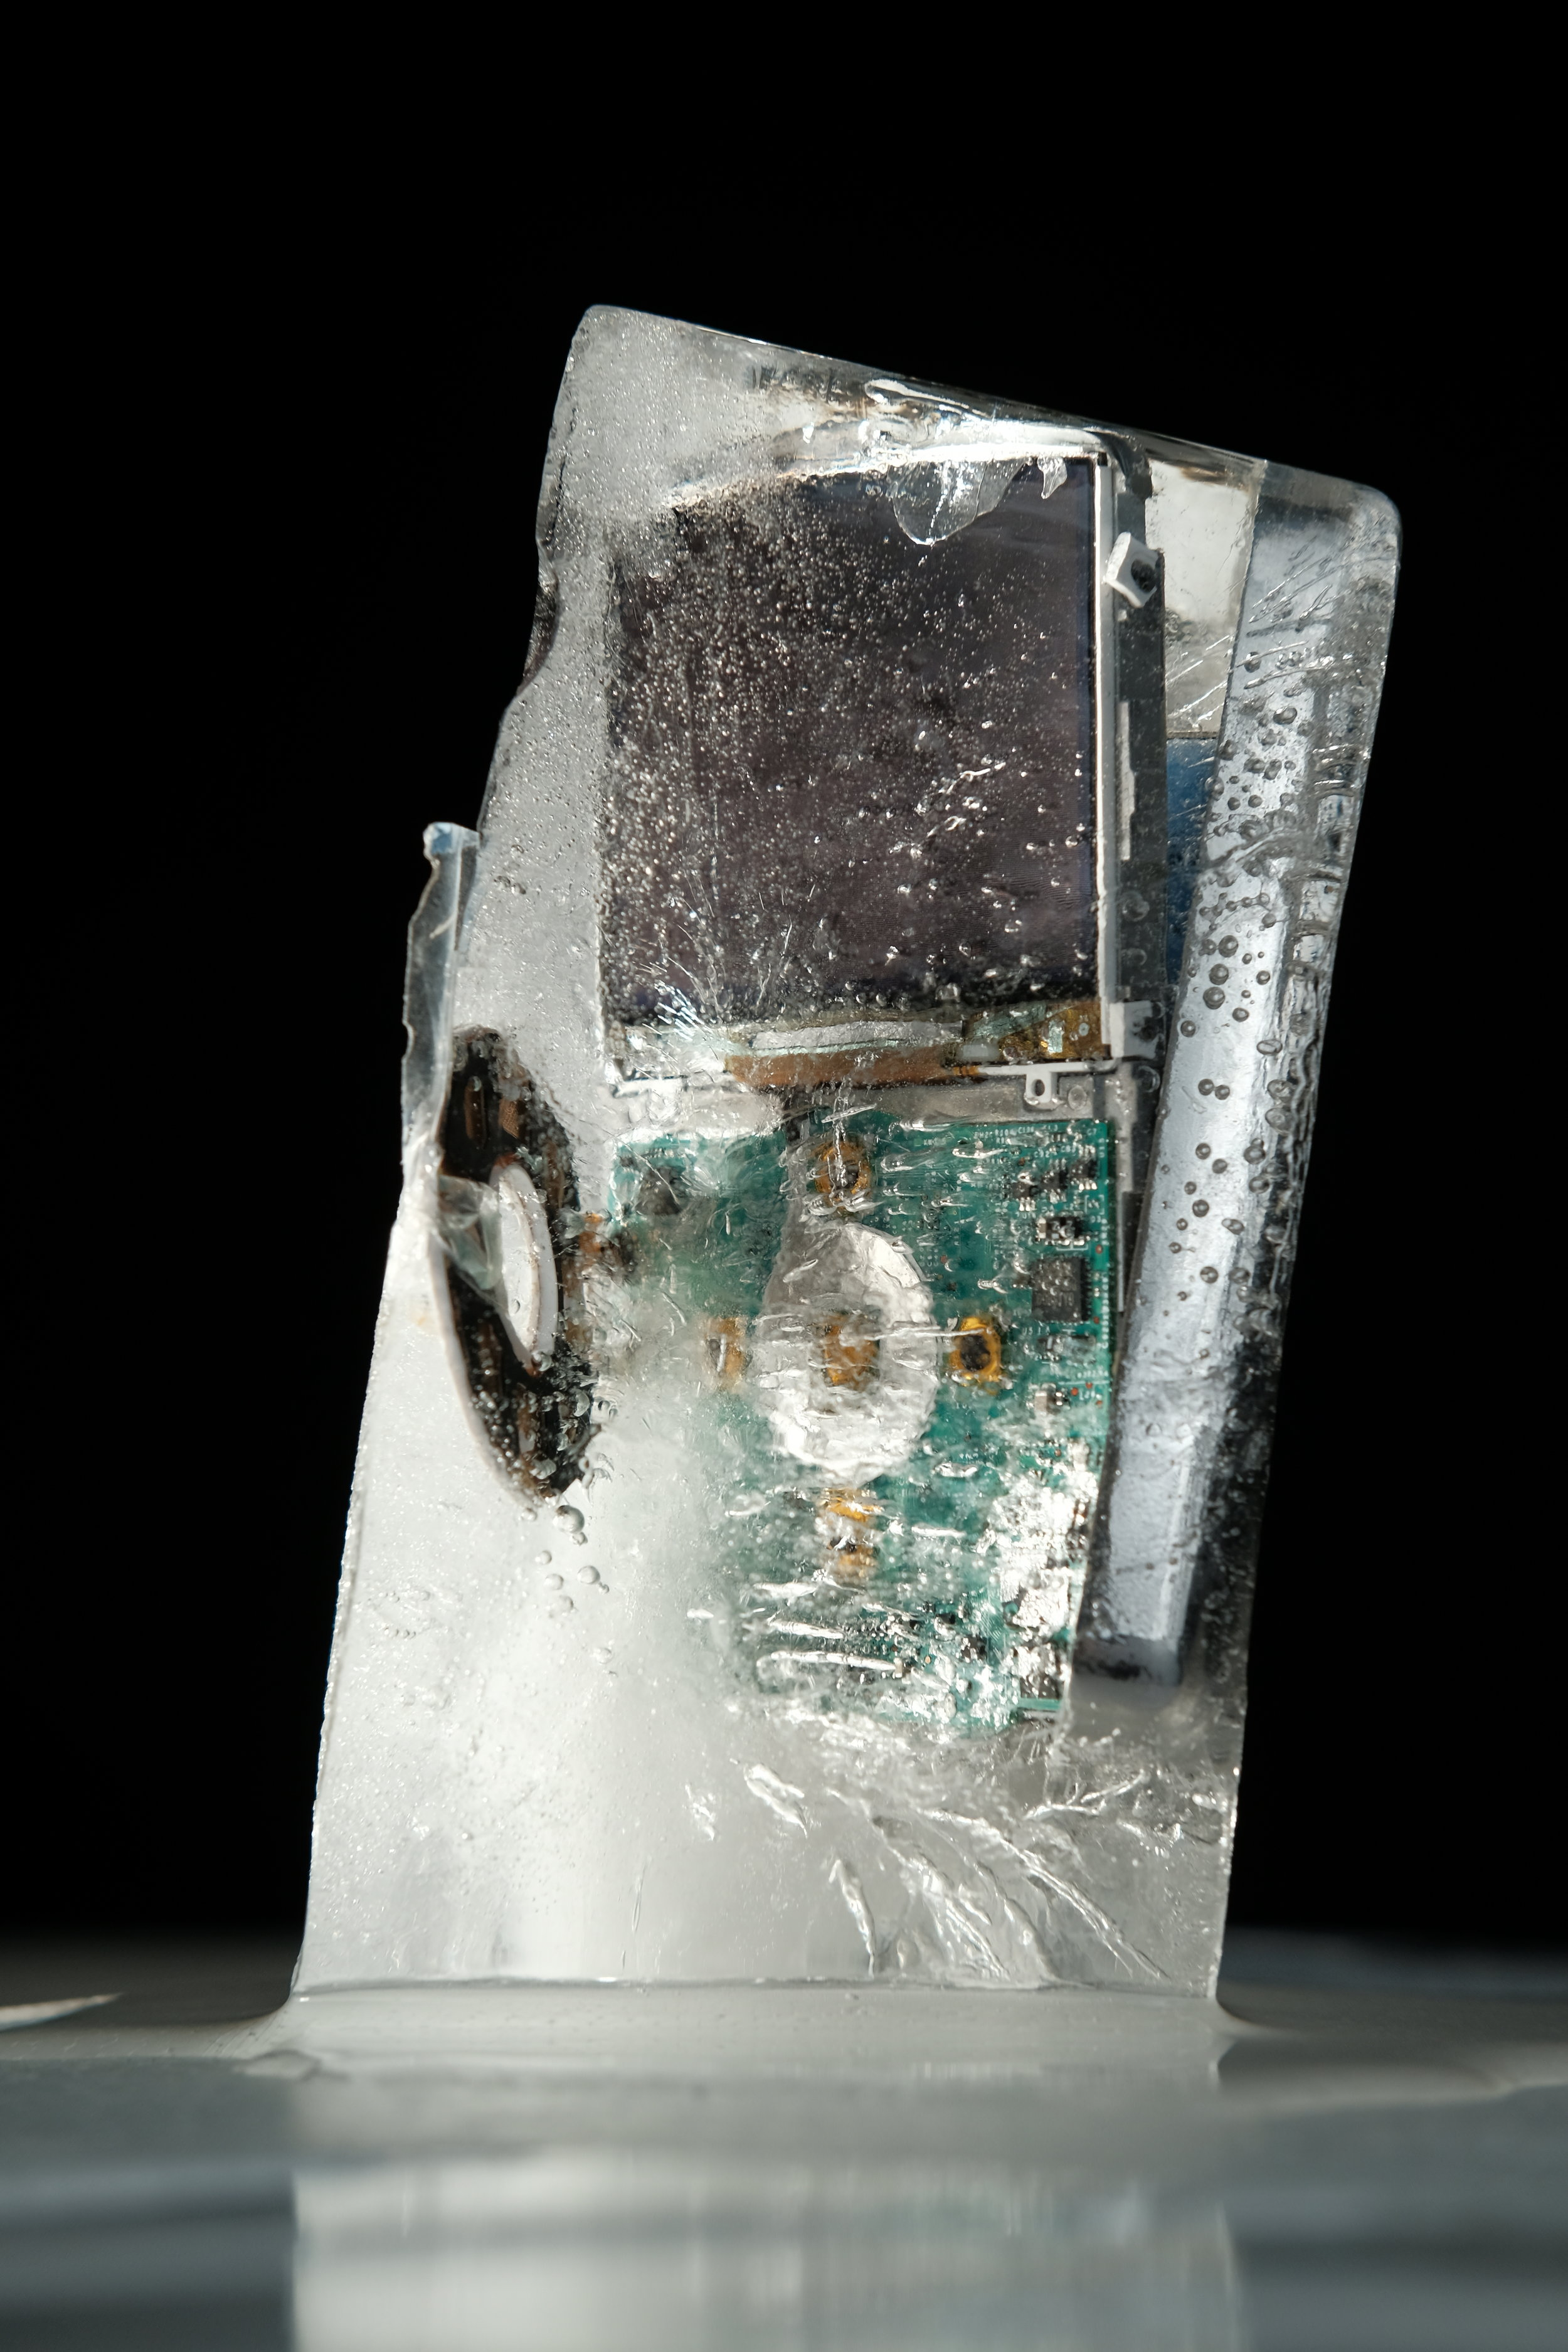 WaterTec-2017-Ipod-glace.JPG